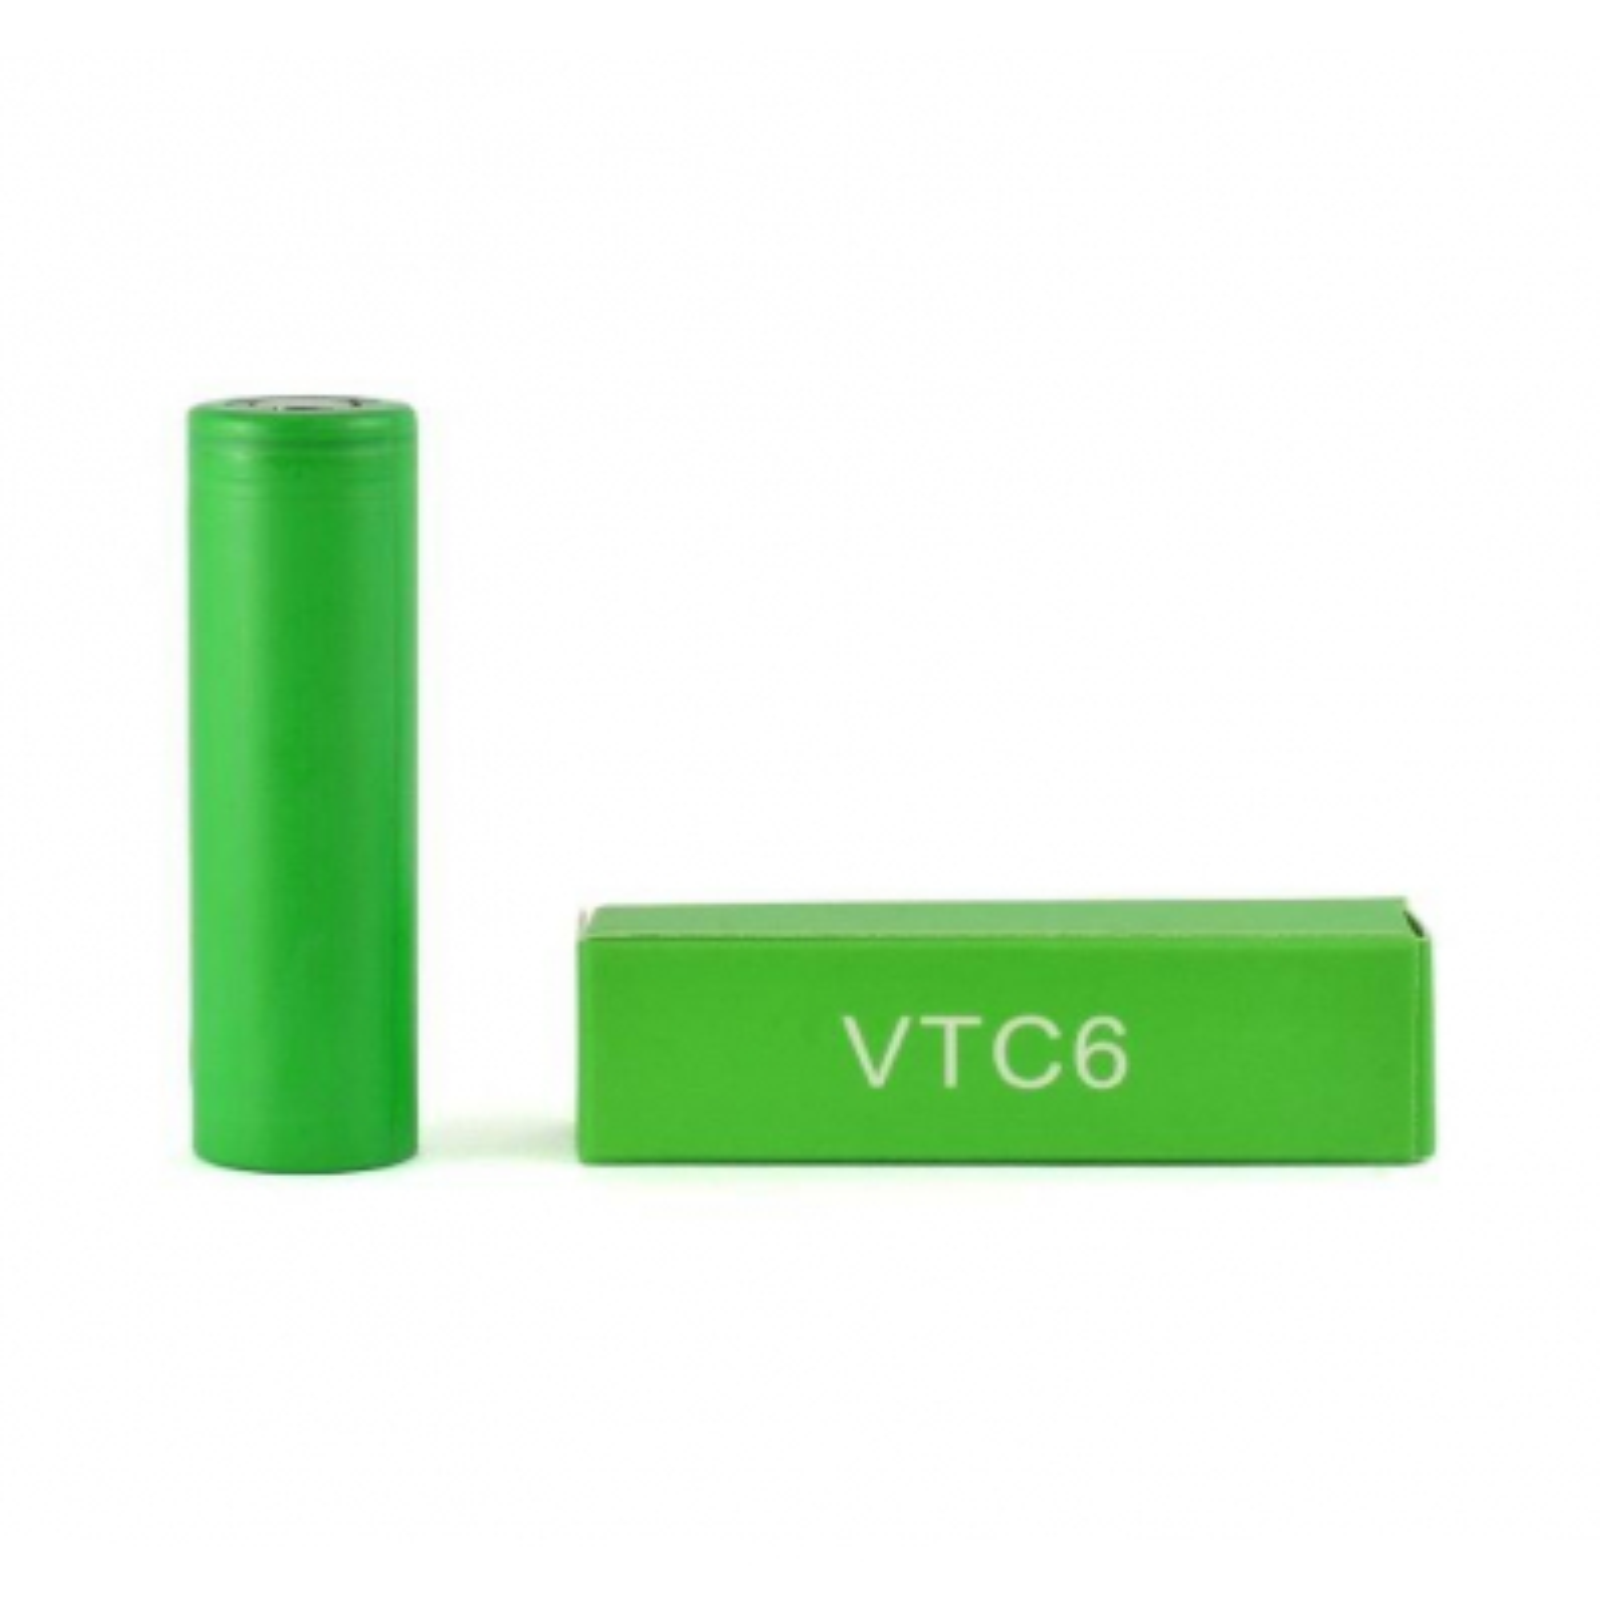 Accu Sony VTC6 18650 - SONY